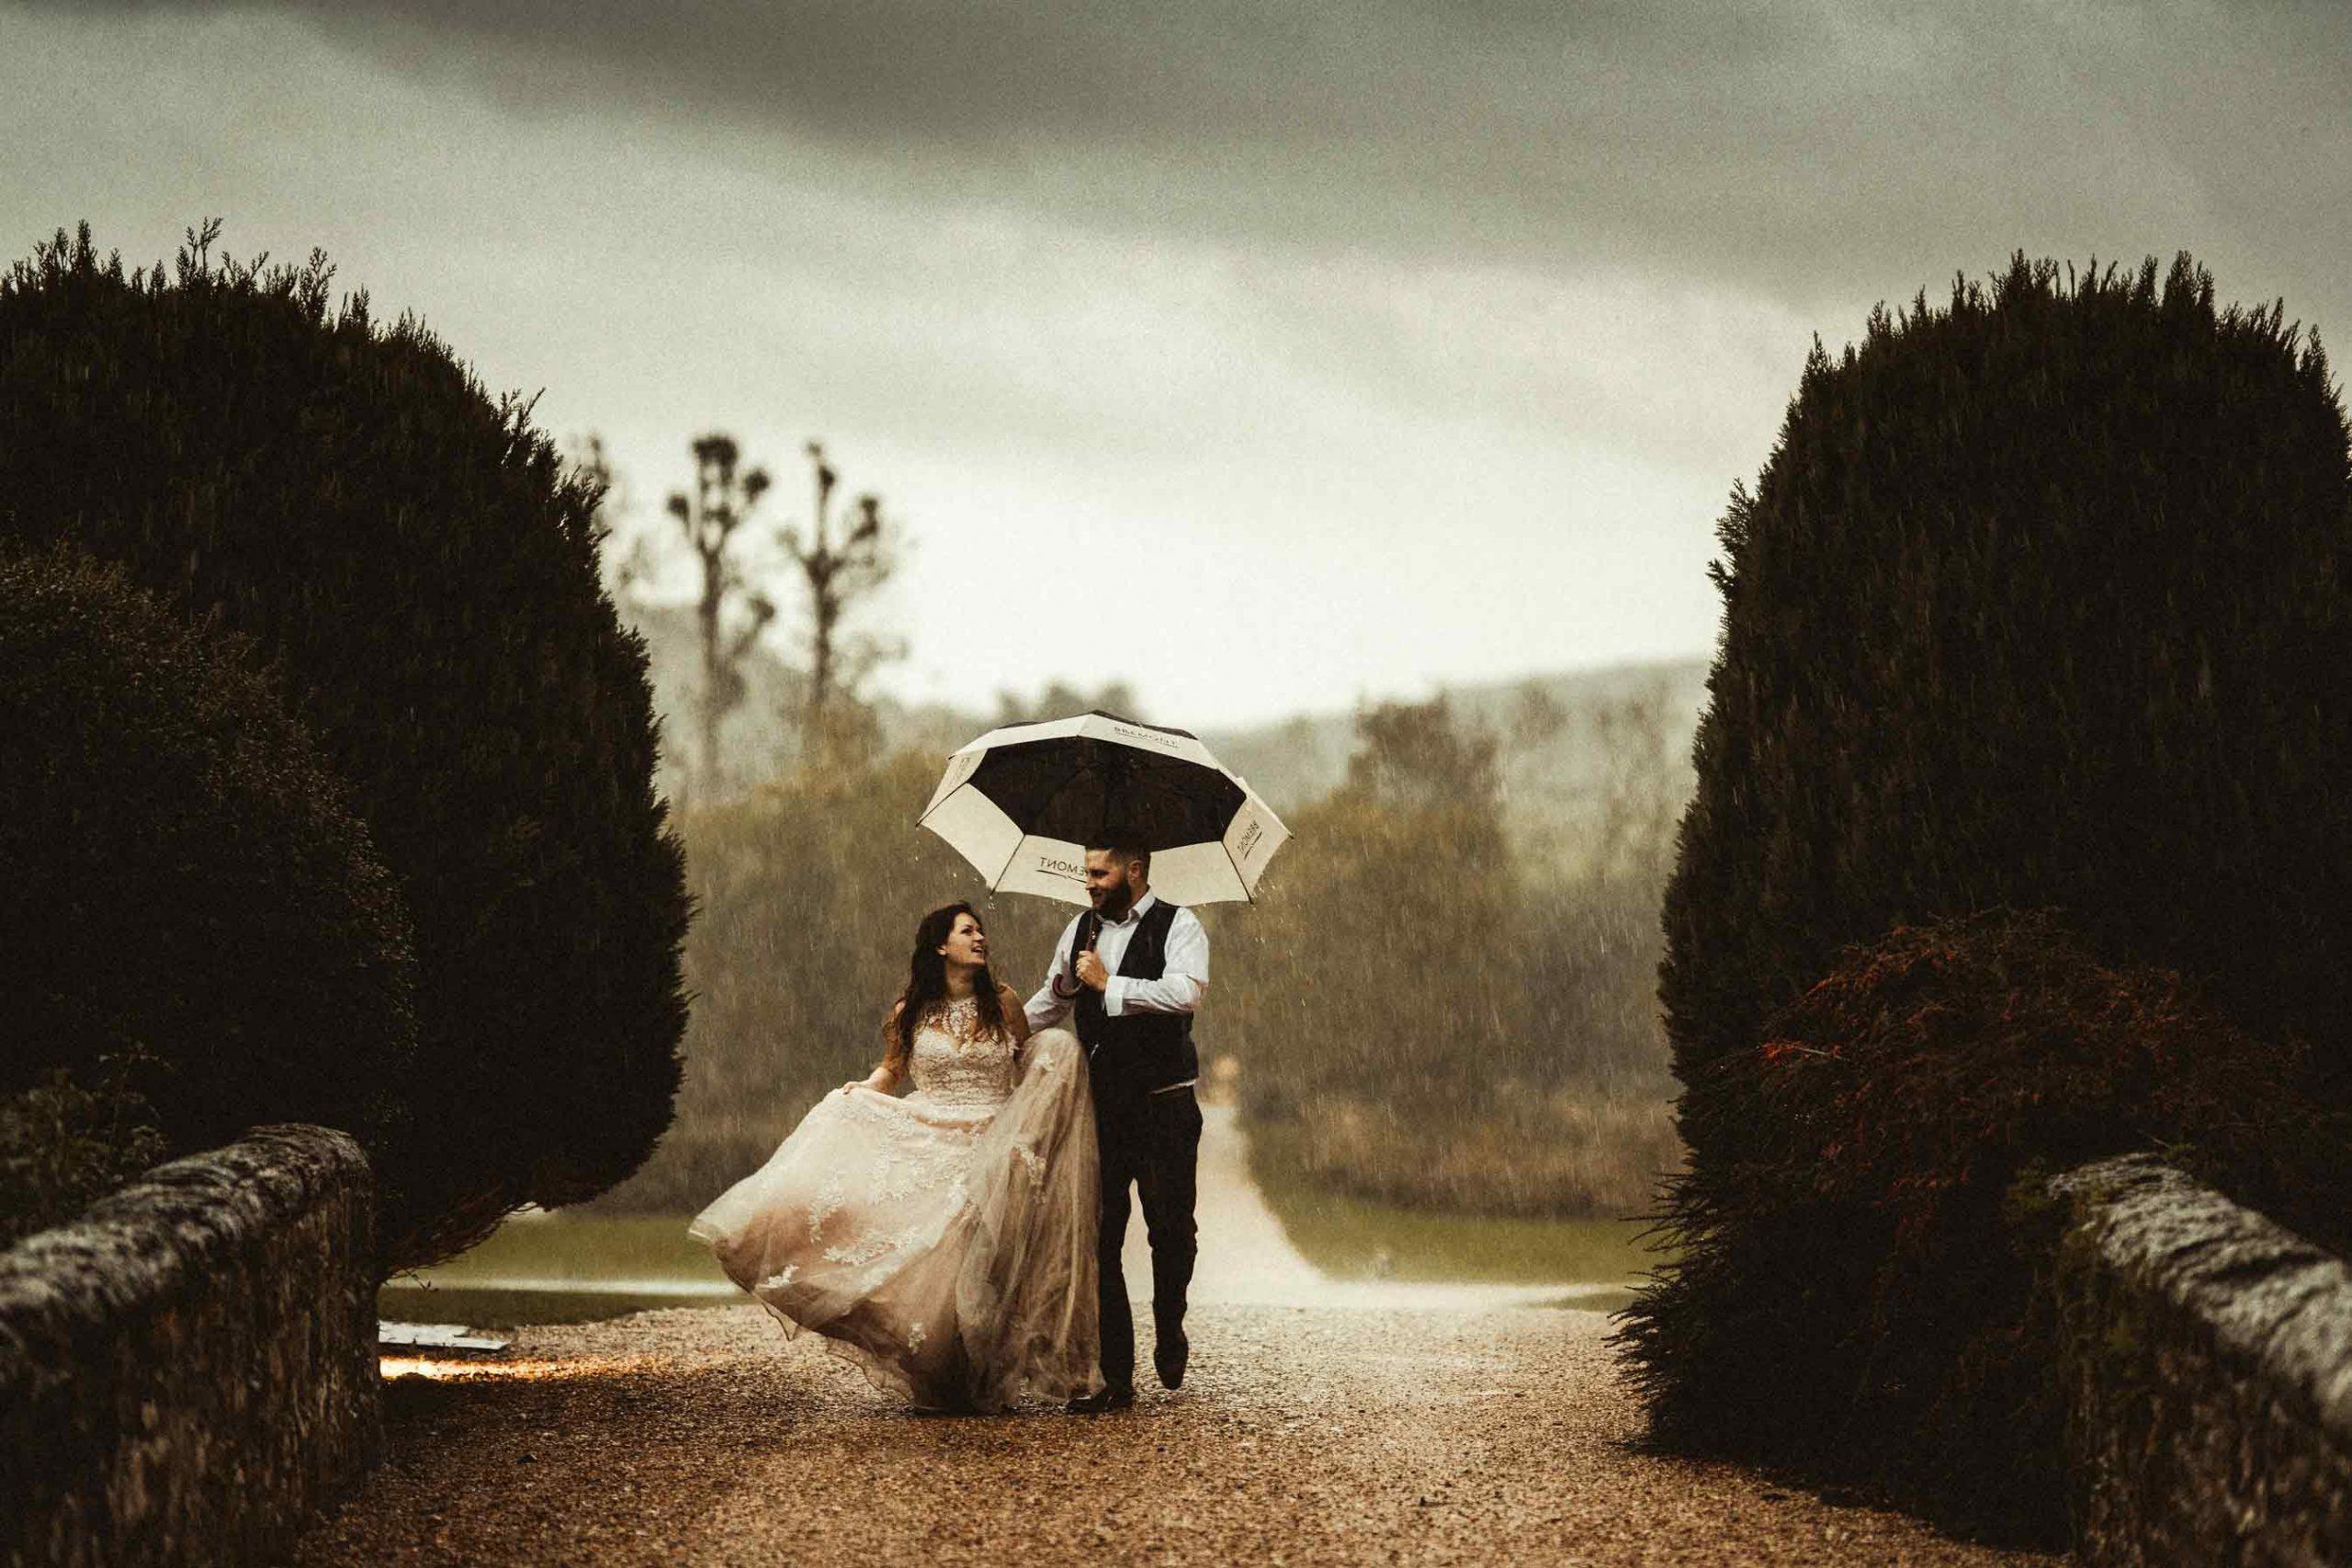 Bride and groom wedding photo in the rain